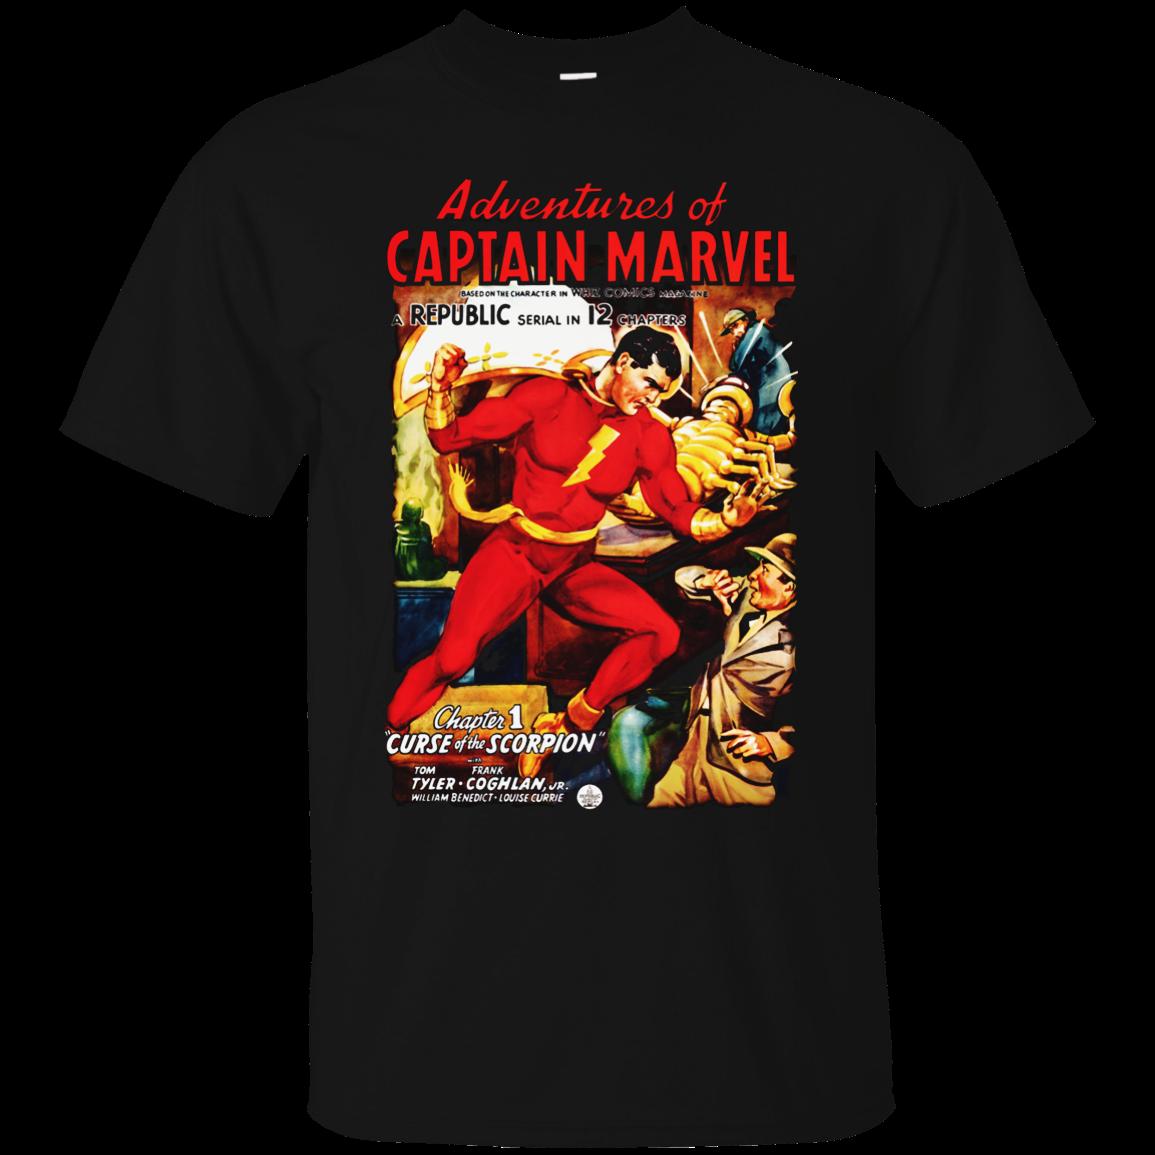 Buy Captain Marvel, Shazam, Retro, Republic Serial, Super Hero, Whiz Comics, Movie, Newest 2019 Fashion Stranger Things T Shirt Men for only 14.99 USD